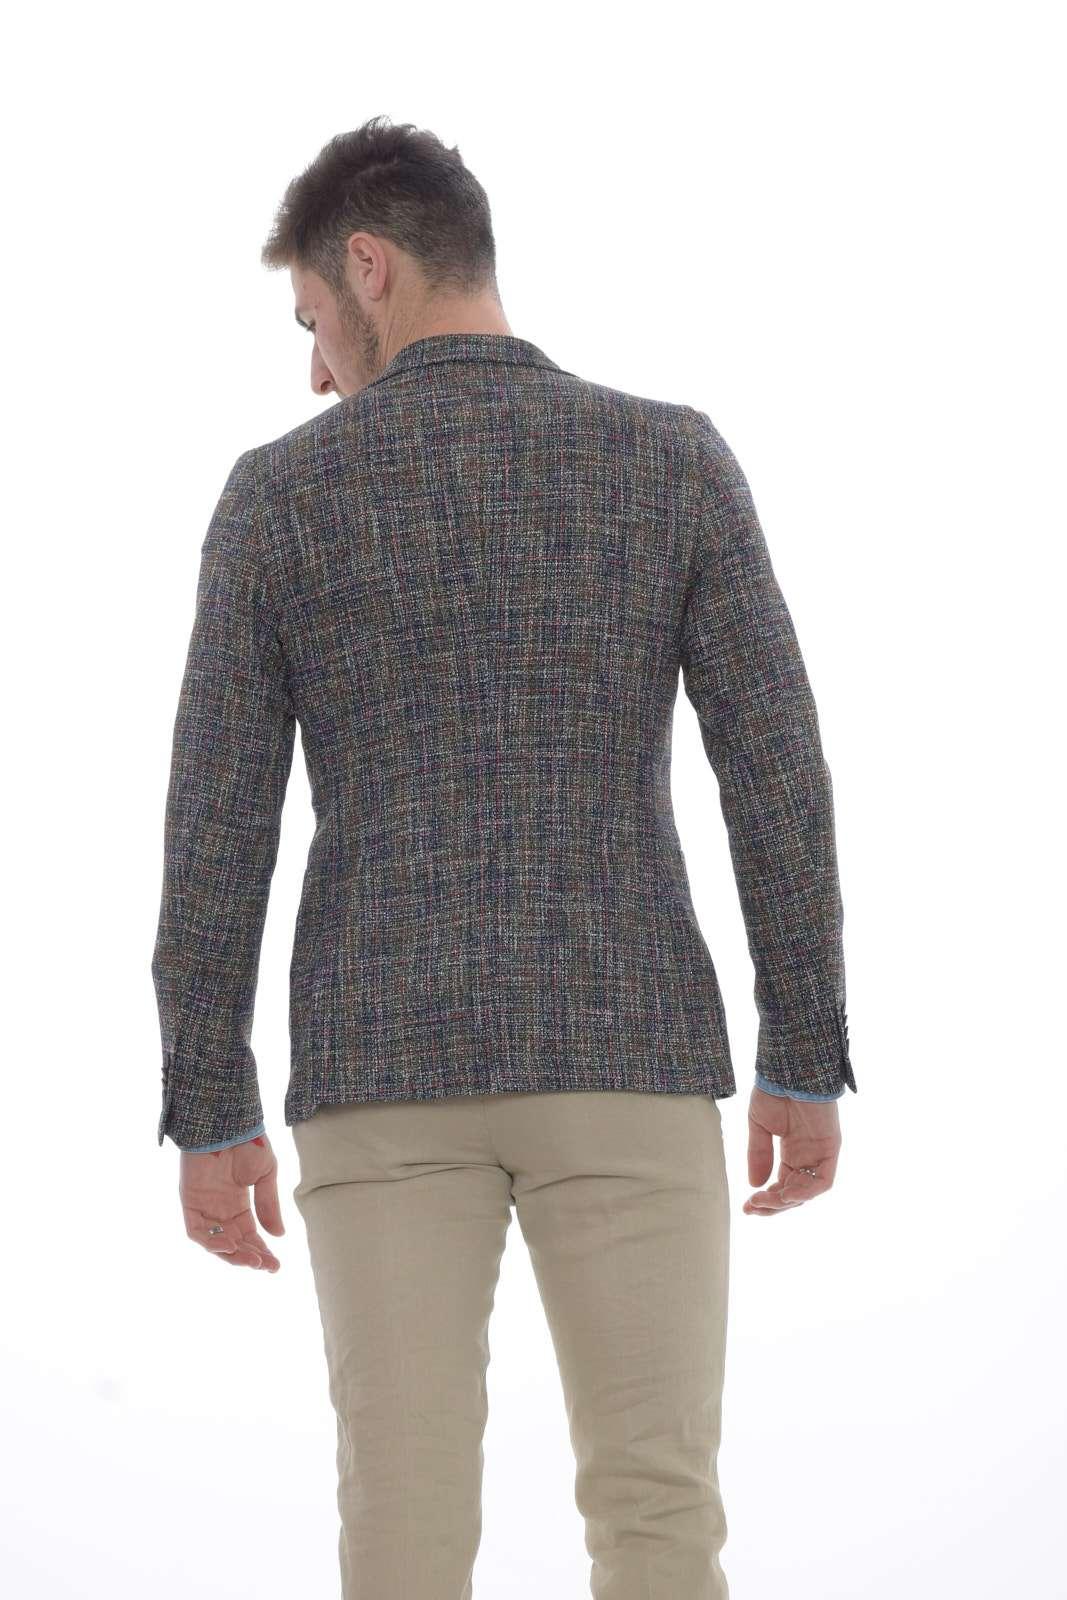 https://www.parmax.com/media/catalog/product/a/i/PE-outlet_parmax-giacca-uomo-Manuel-Ritz-2632G2038%20193165-C.jpg